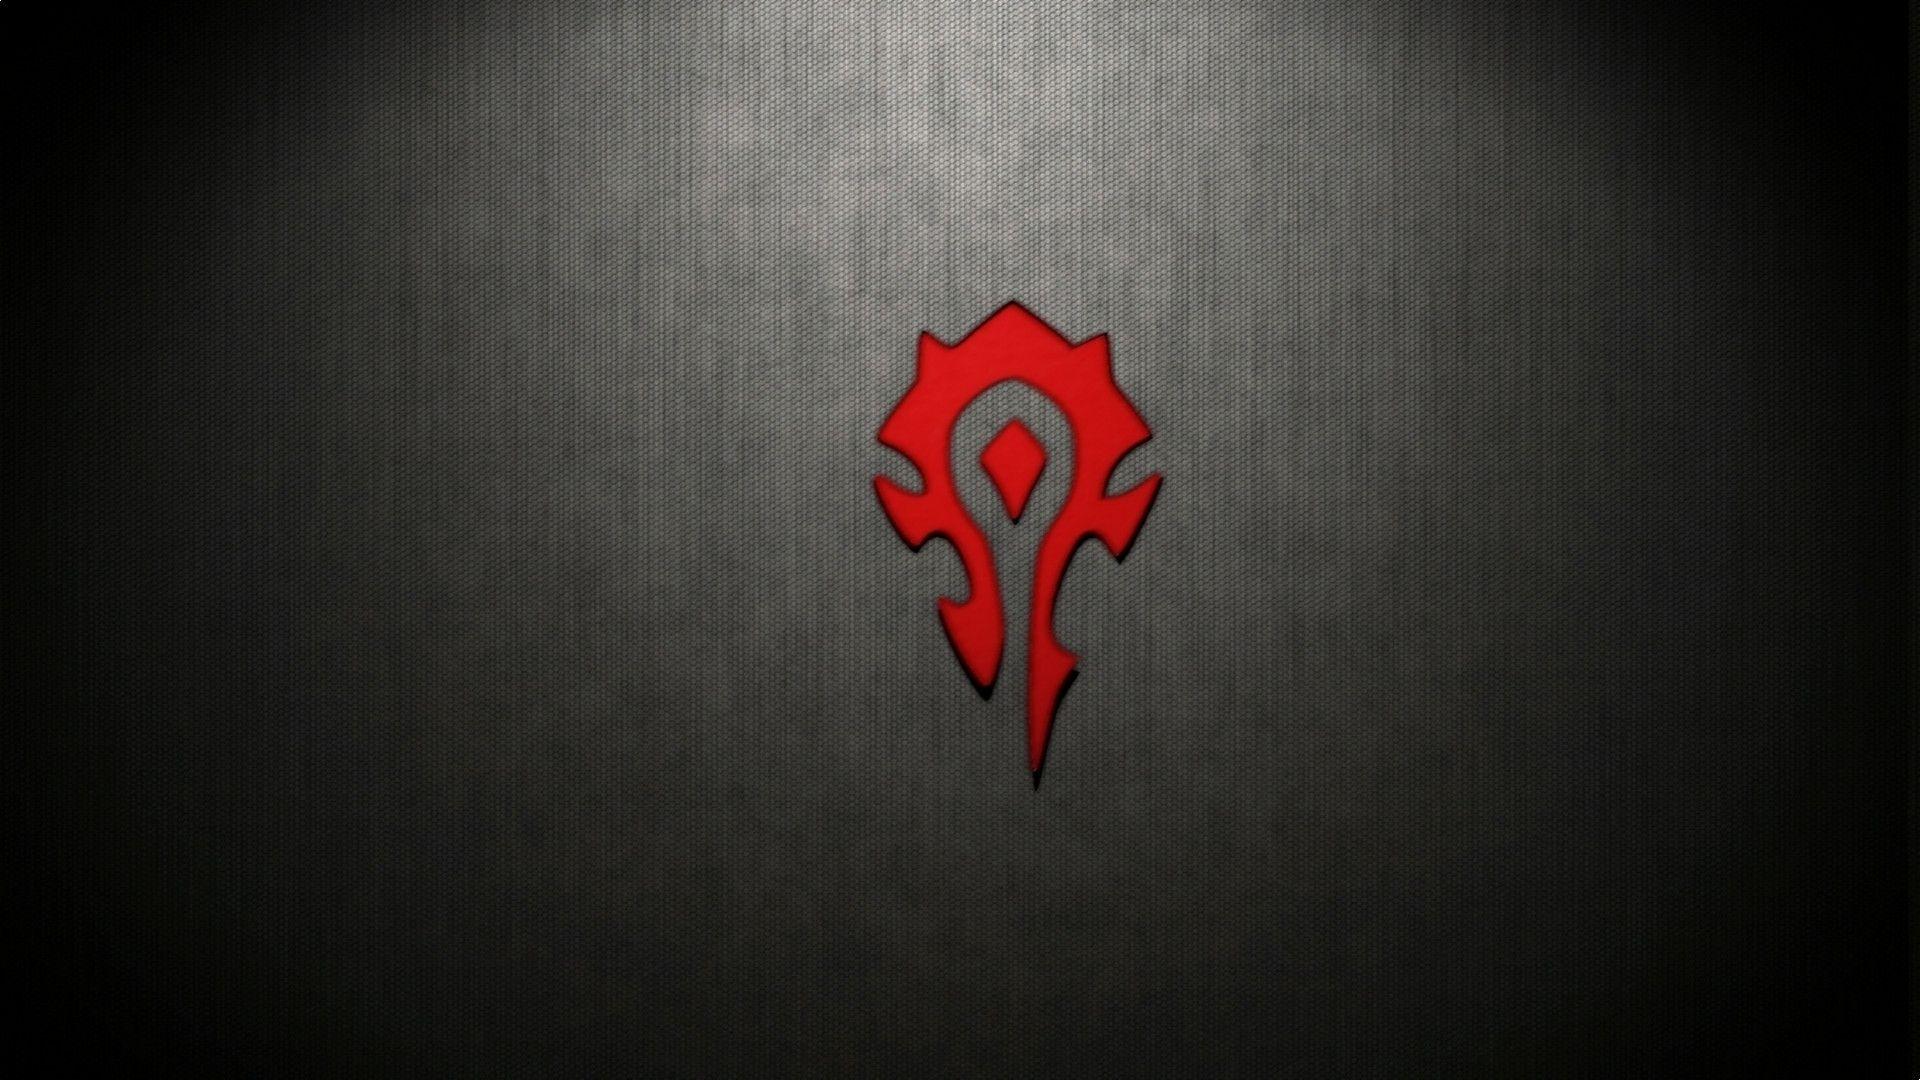 horde logo wallpapers - wallpaper cave   wallpapers   pinterest